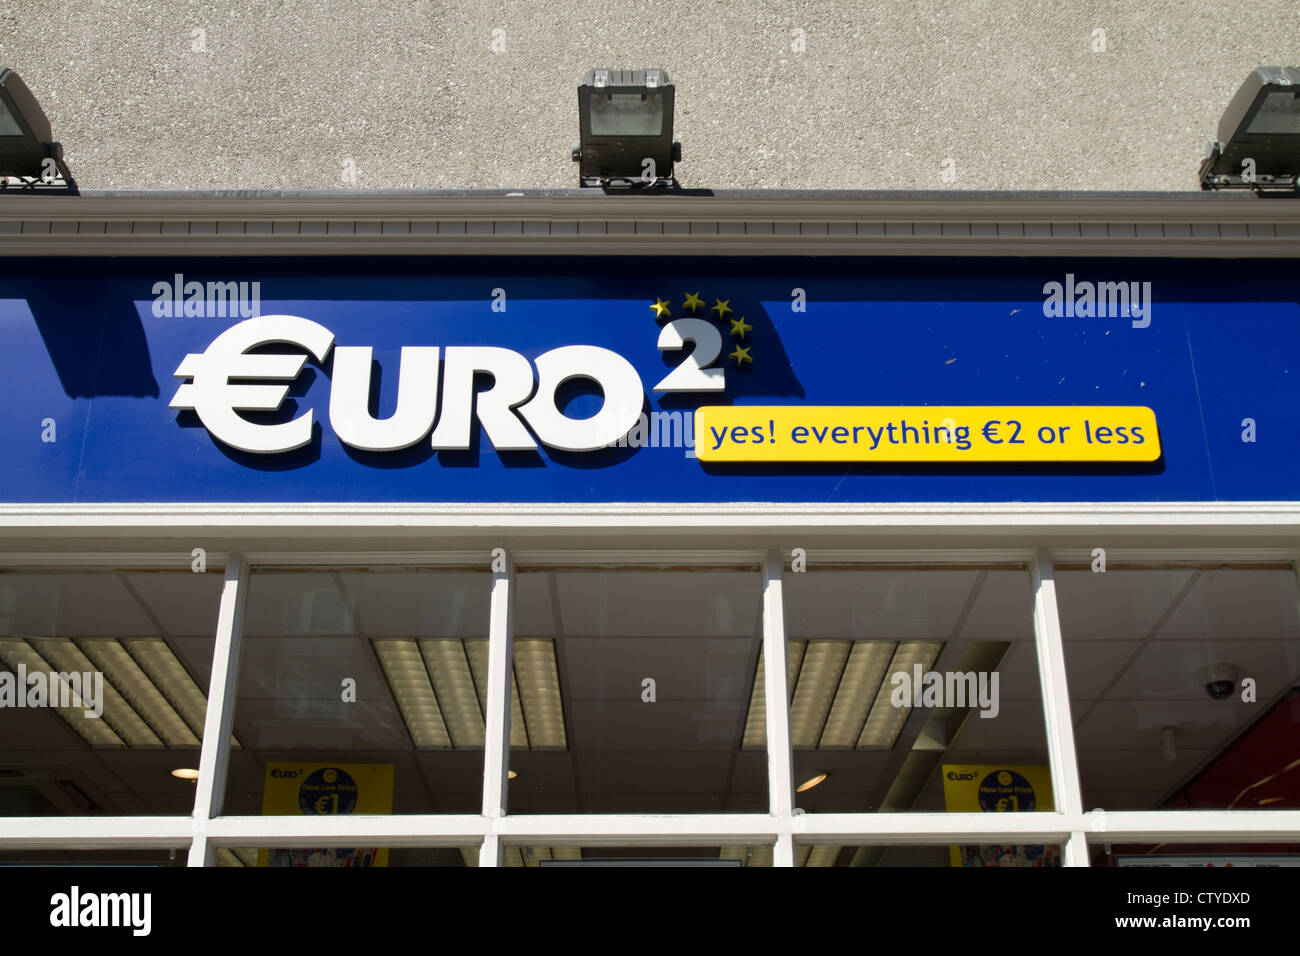 euro shopper €2 discount store shopfront sign - Stock Image